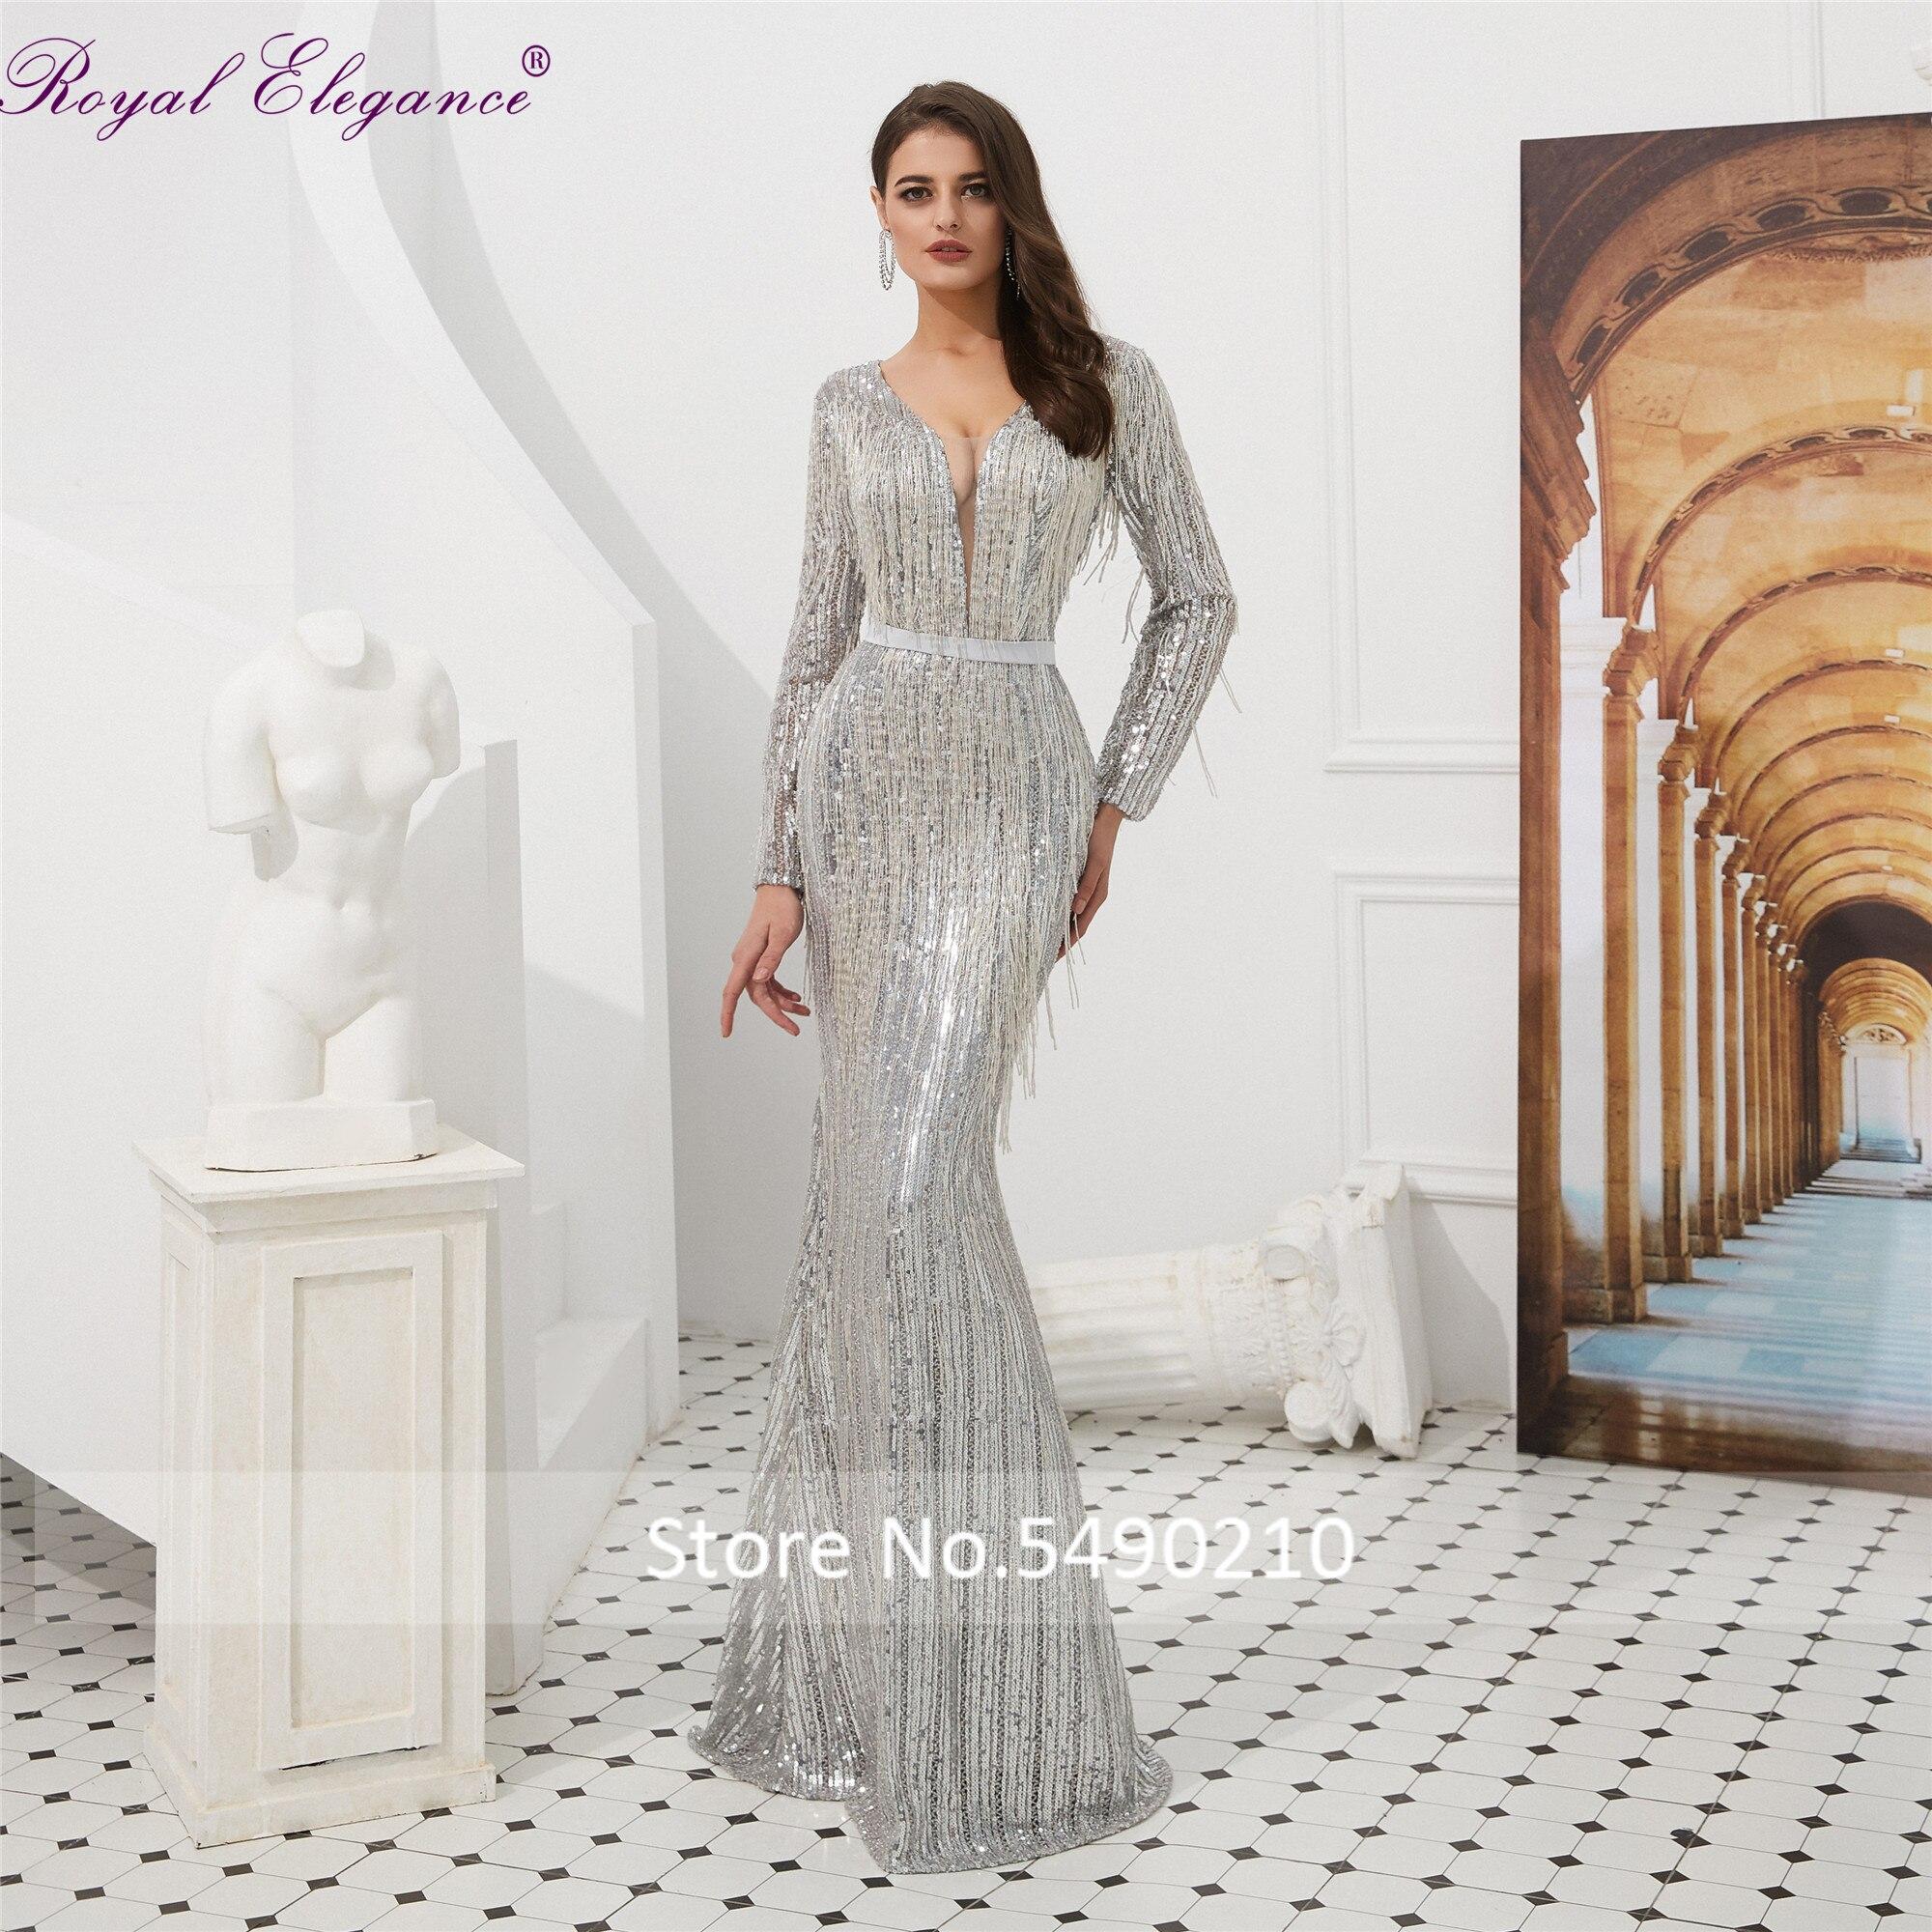 Royal Elegance 2020 Sexy Heavy Beaded Tassel Mermaid Evening Dress Long Sleeve V Neckline Prom Dress Occasional Wear